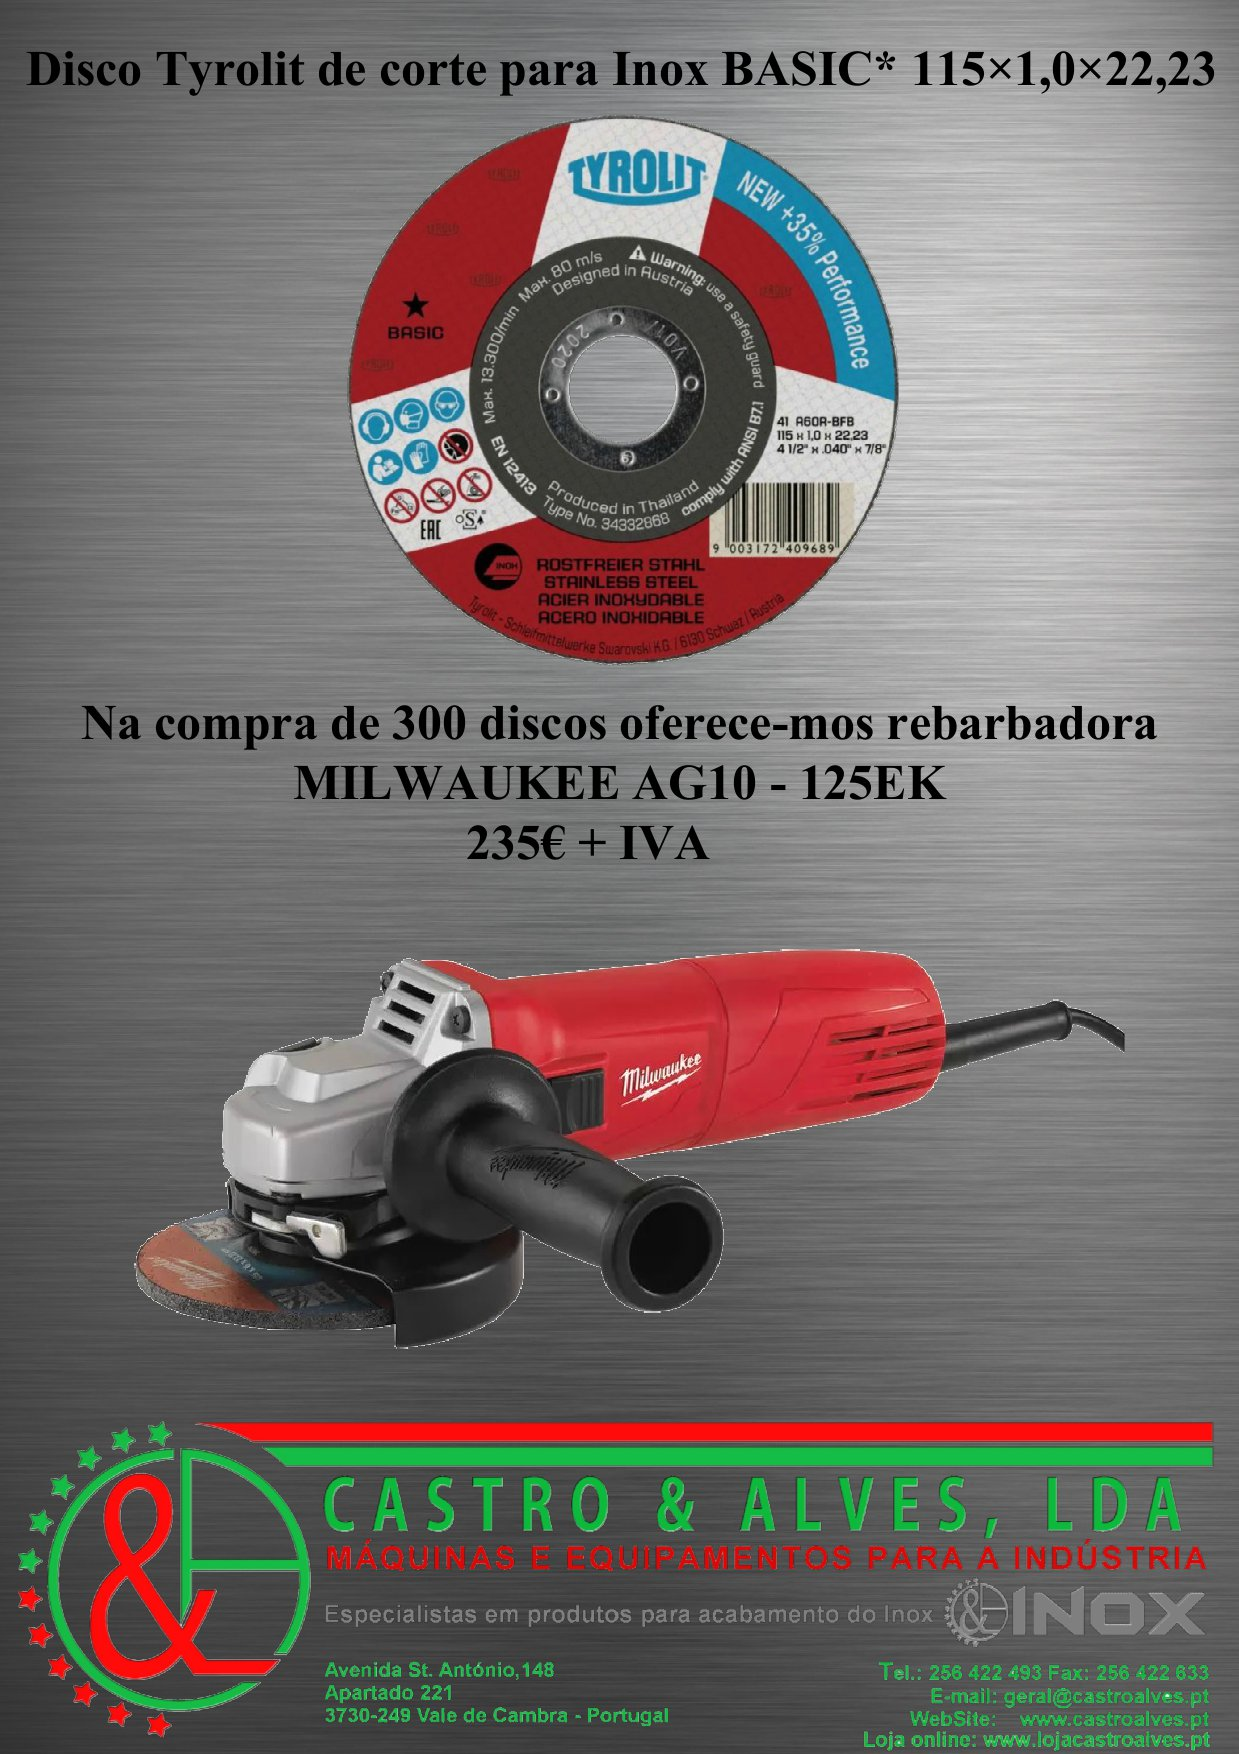 Tyrolit discos 115 inox